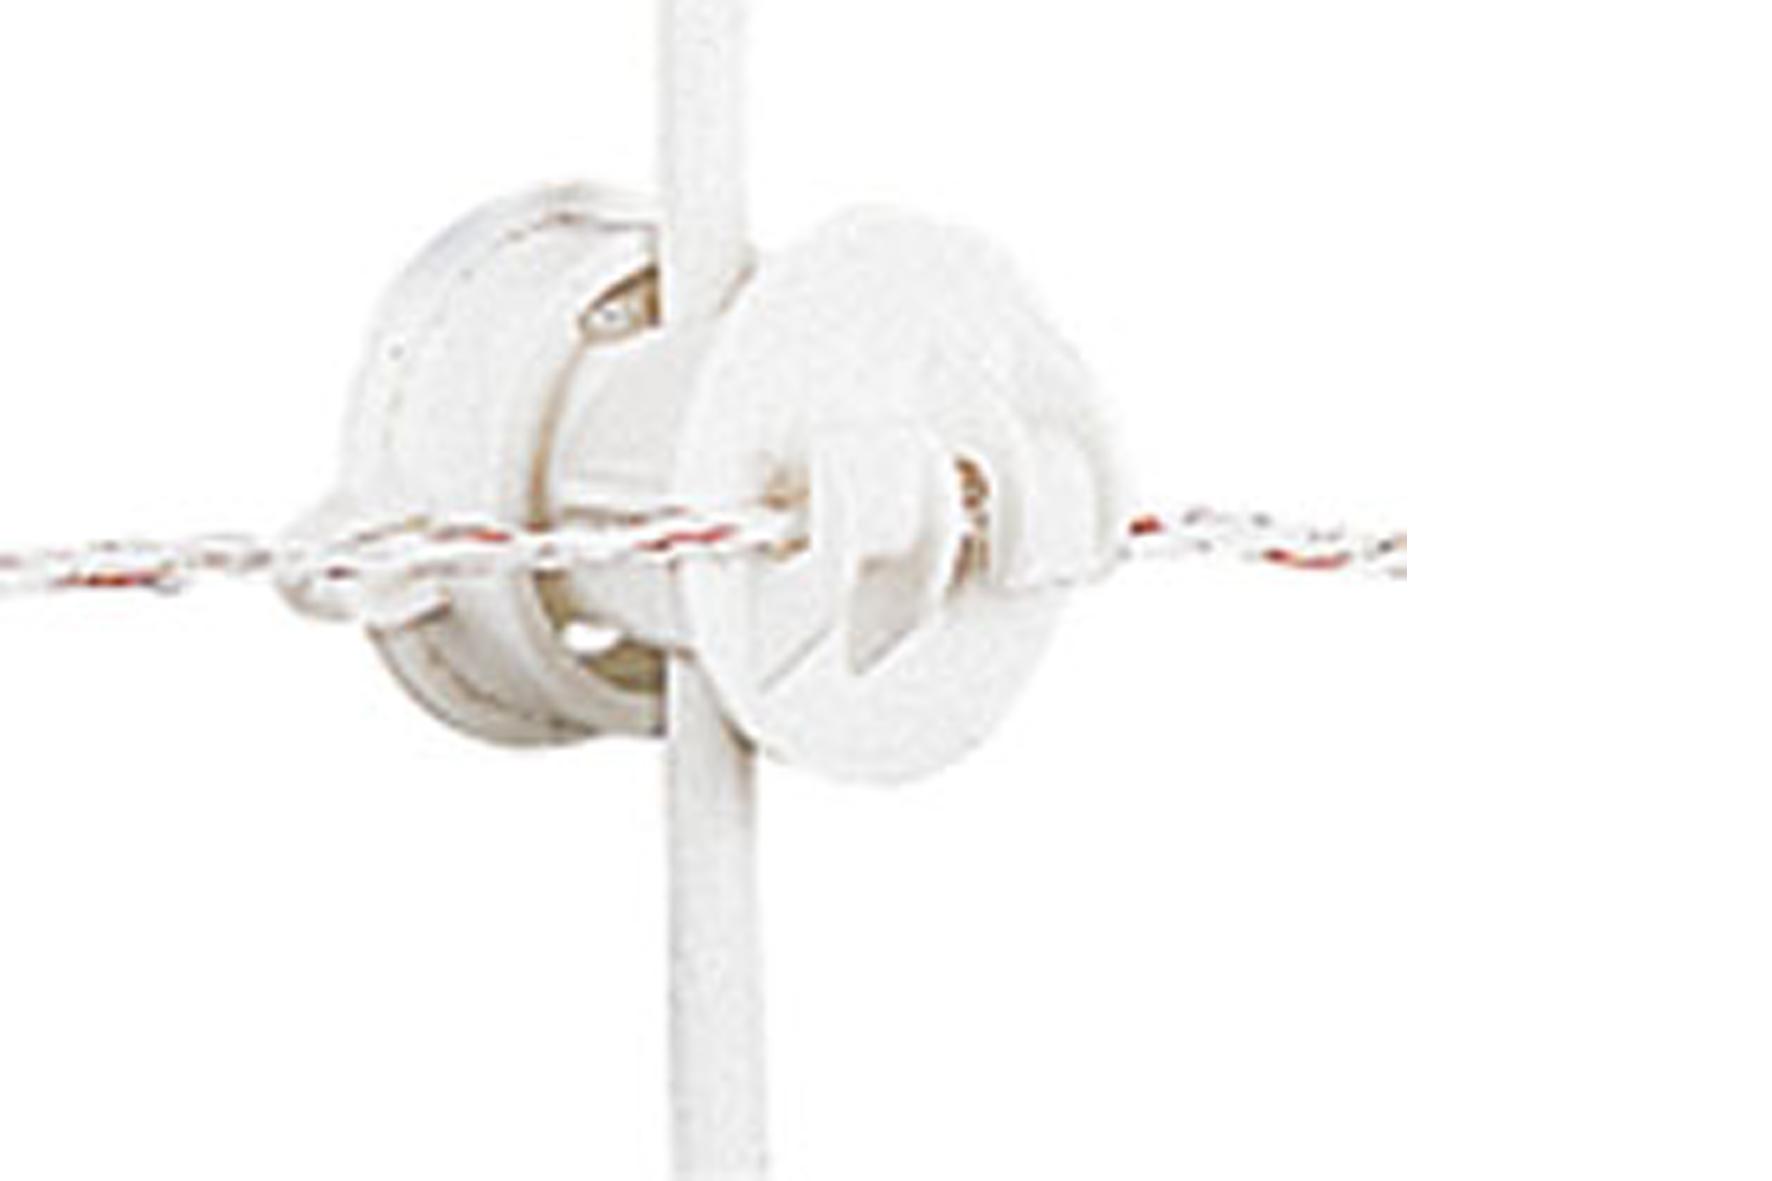 isolateur fer rond ecrou blanc 6 16mm achat en ligne ou dans notre magasin. Black Bedroom Furniture Sets. Home Design Ideas